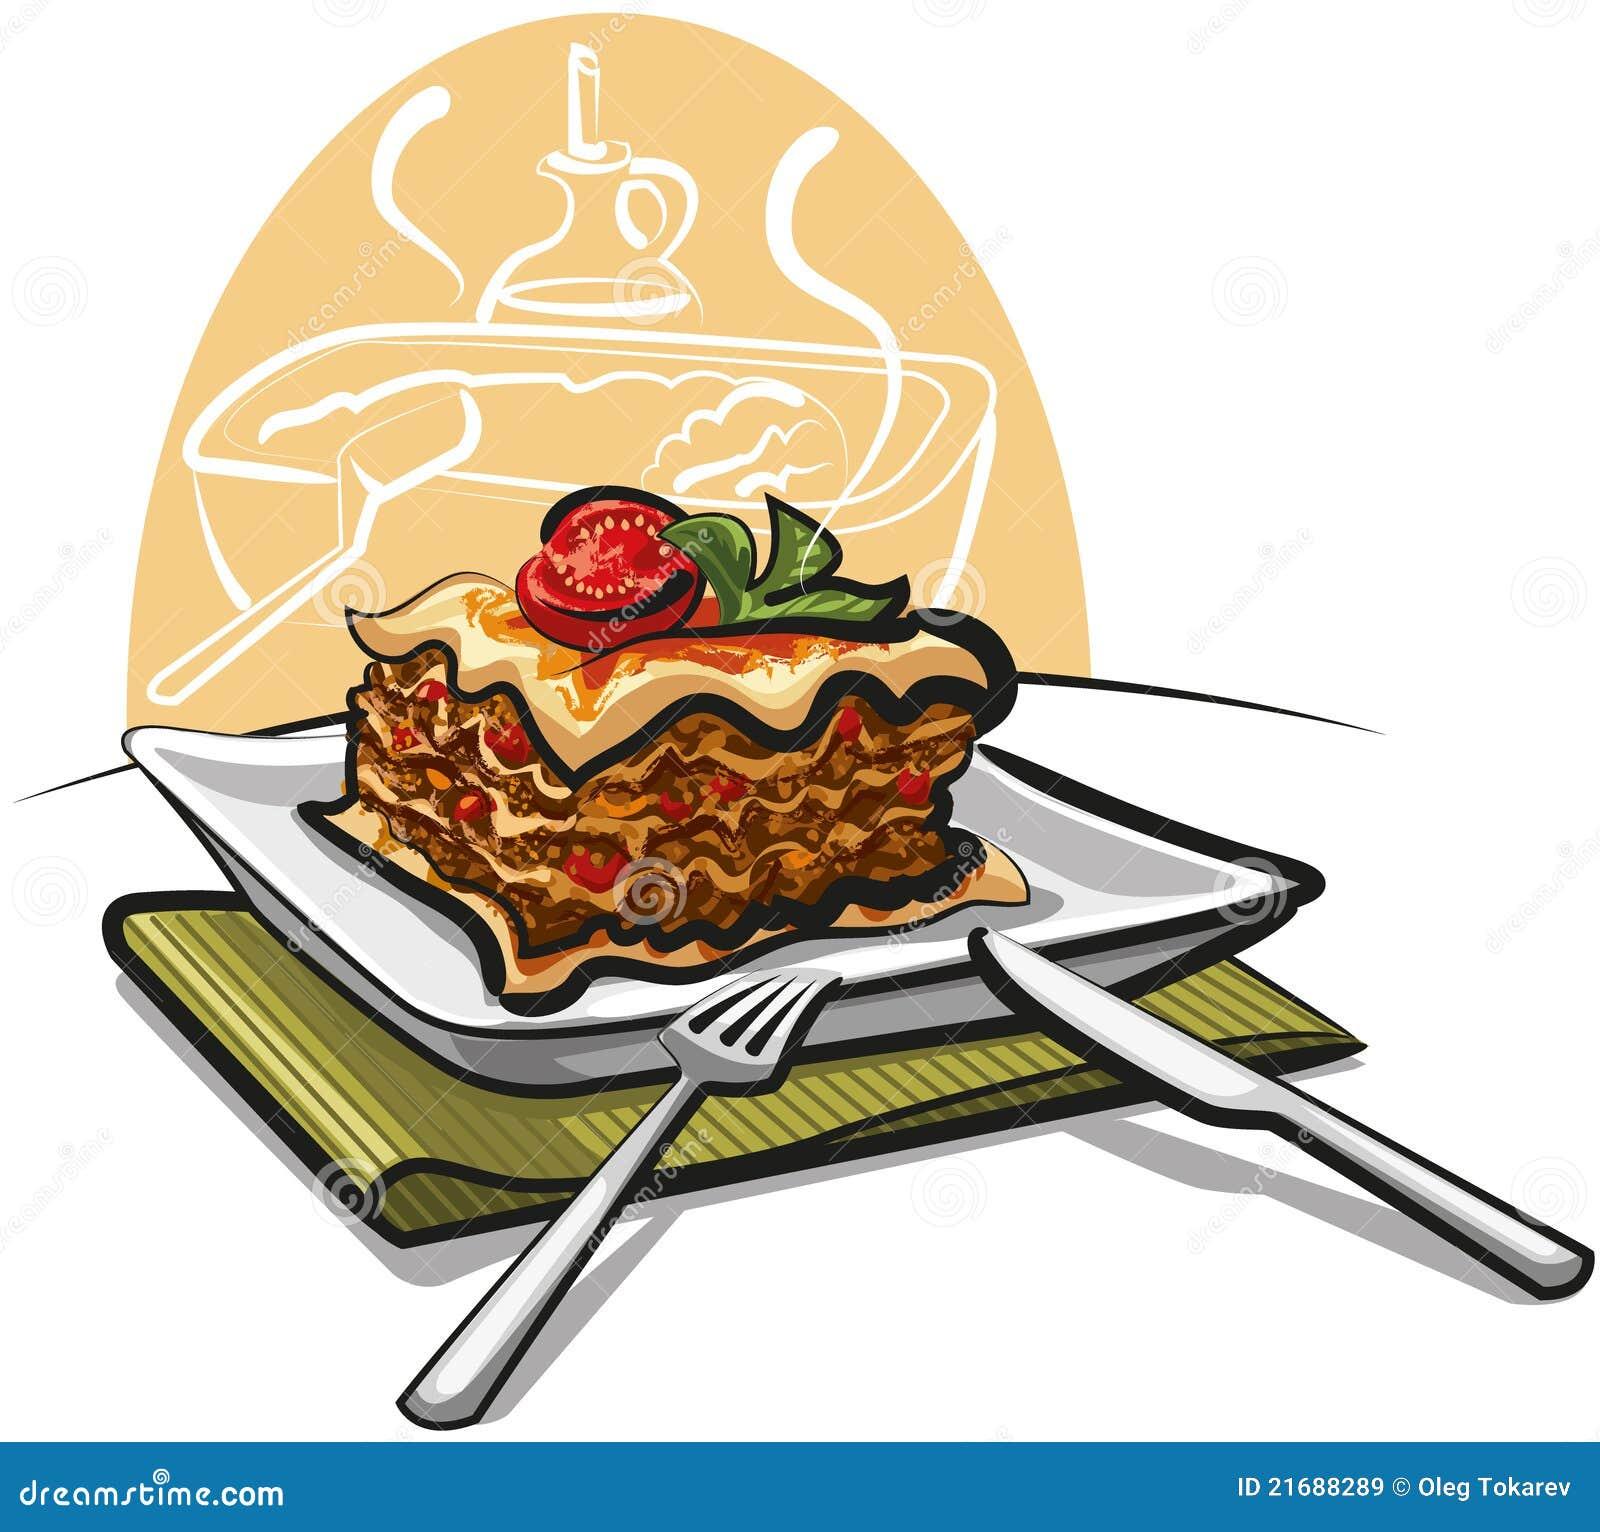 Baked Lasagna Royalty Free Stock Images - Image: 21688289